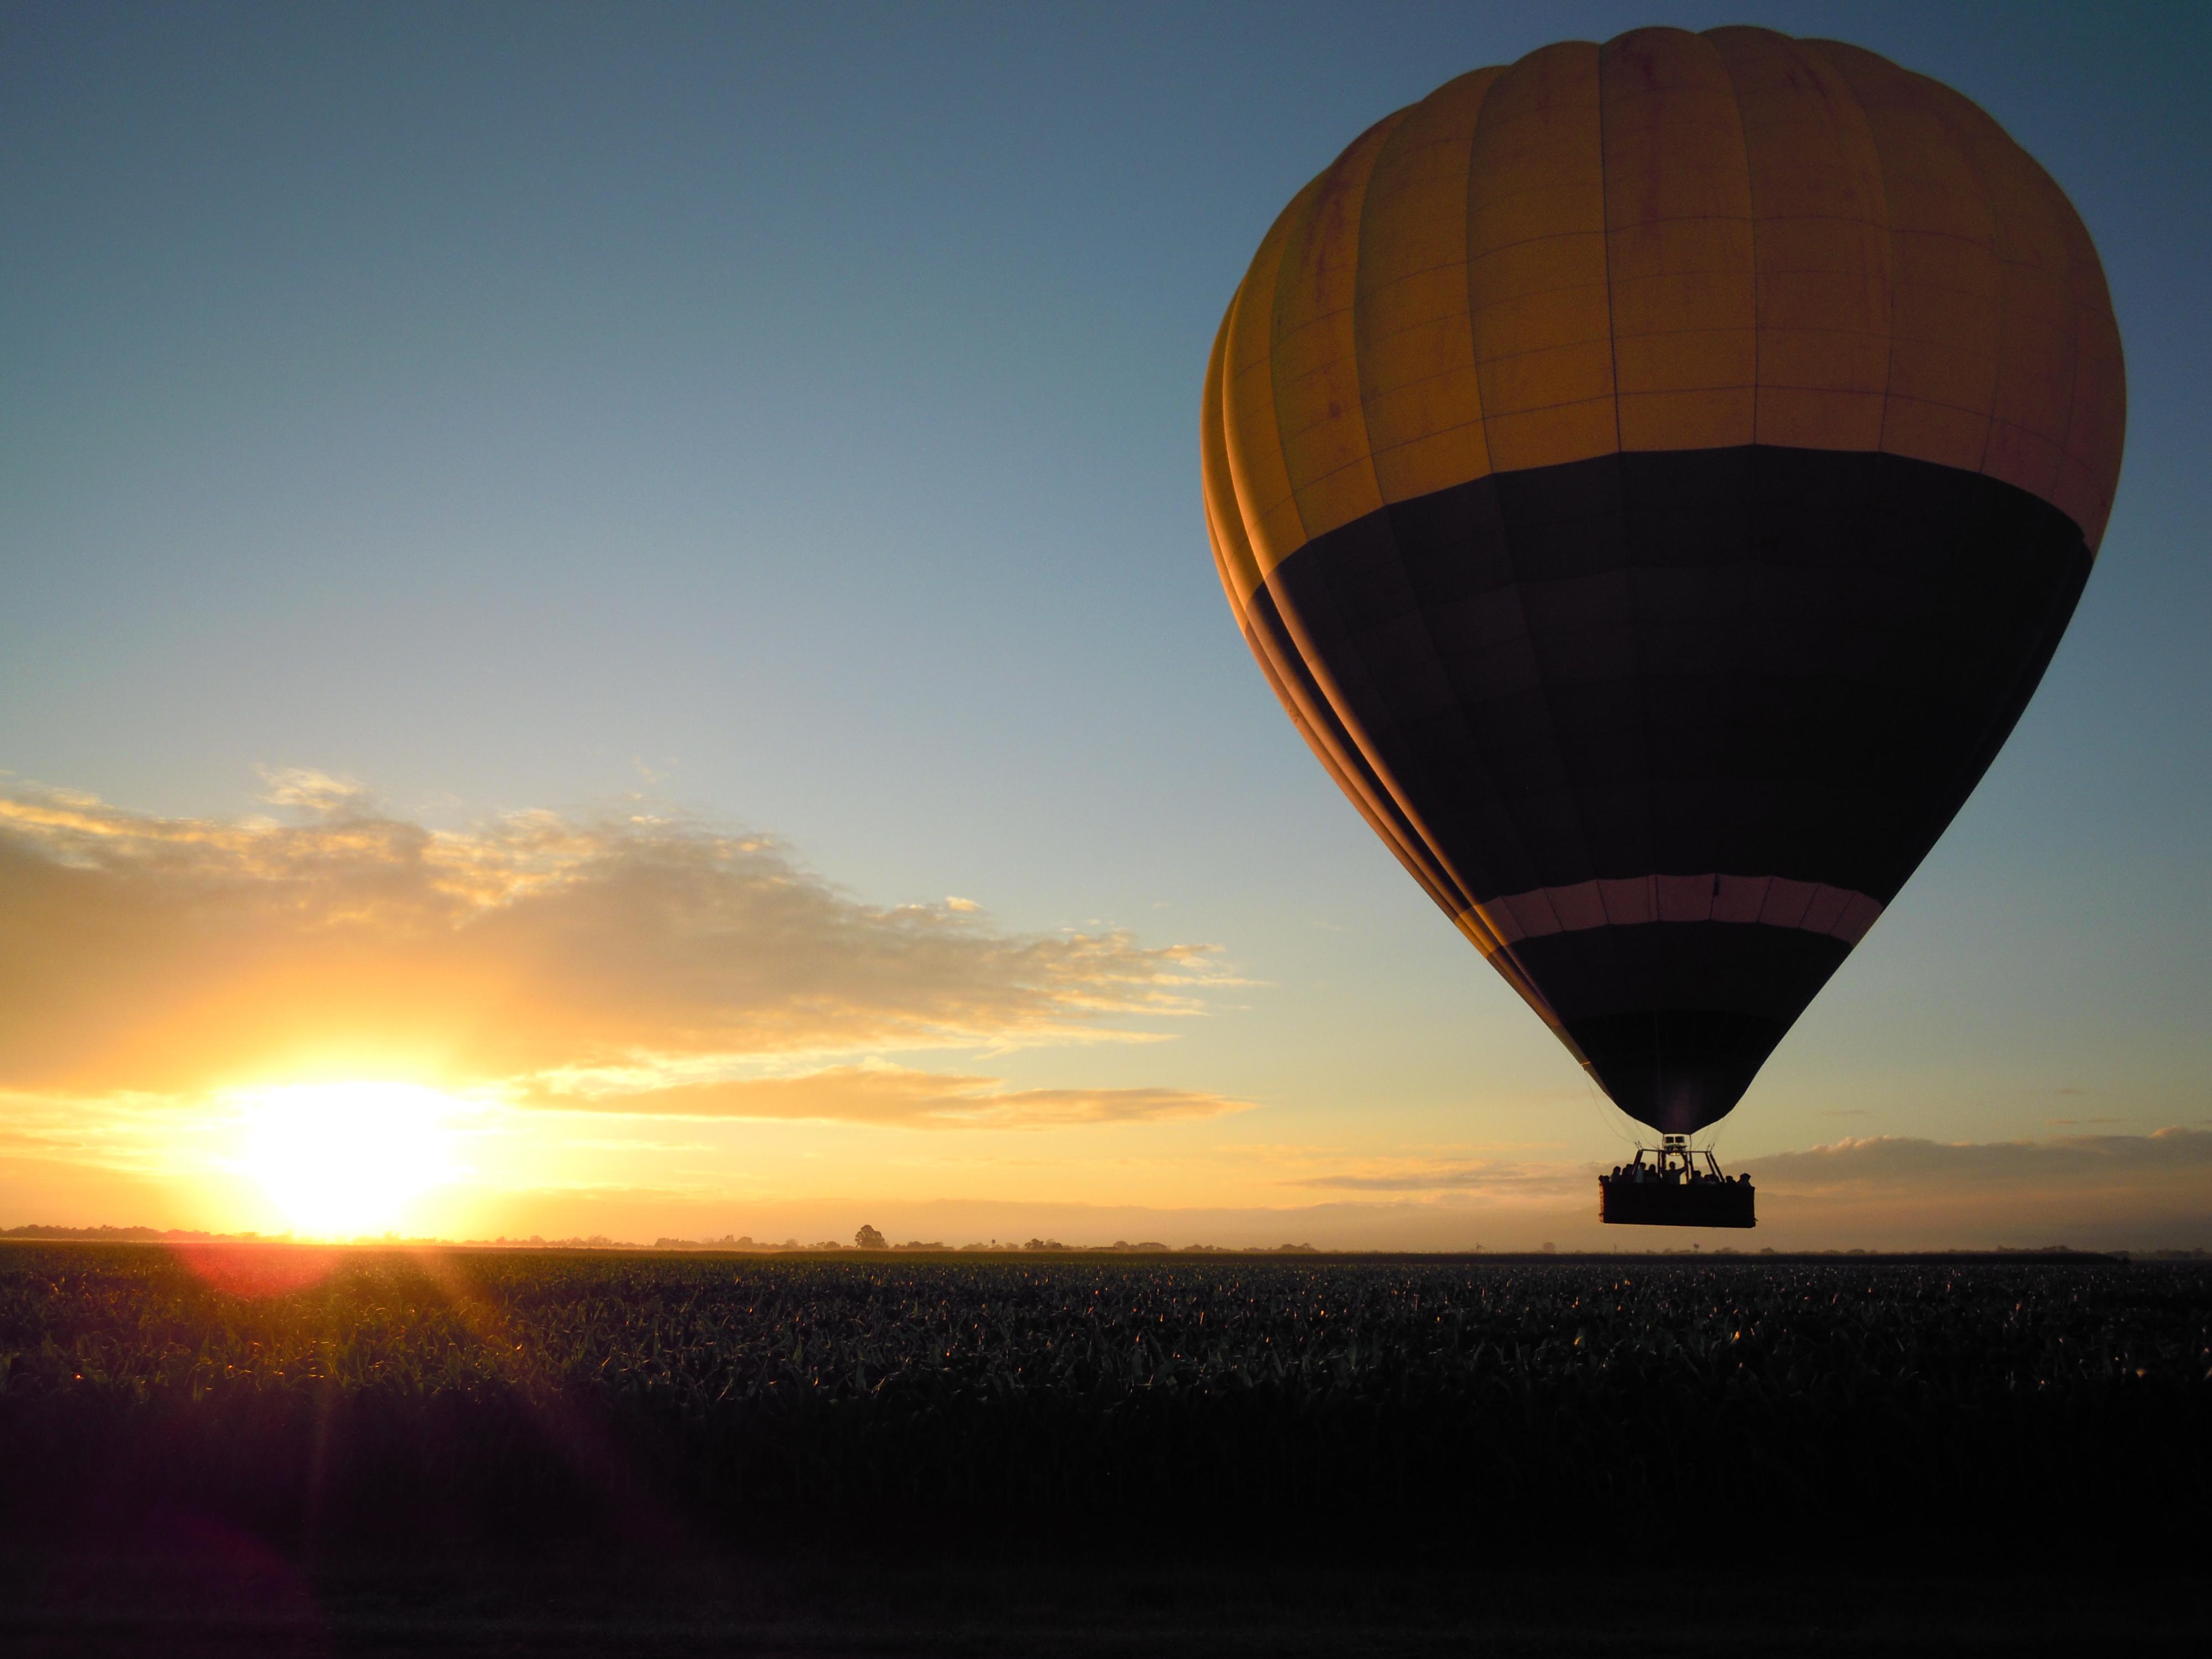 <p>大自然を空から一望できる熱気球は、必見の価値あり。神々しい景色が目の前に広がります。</p>